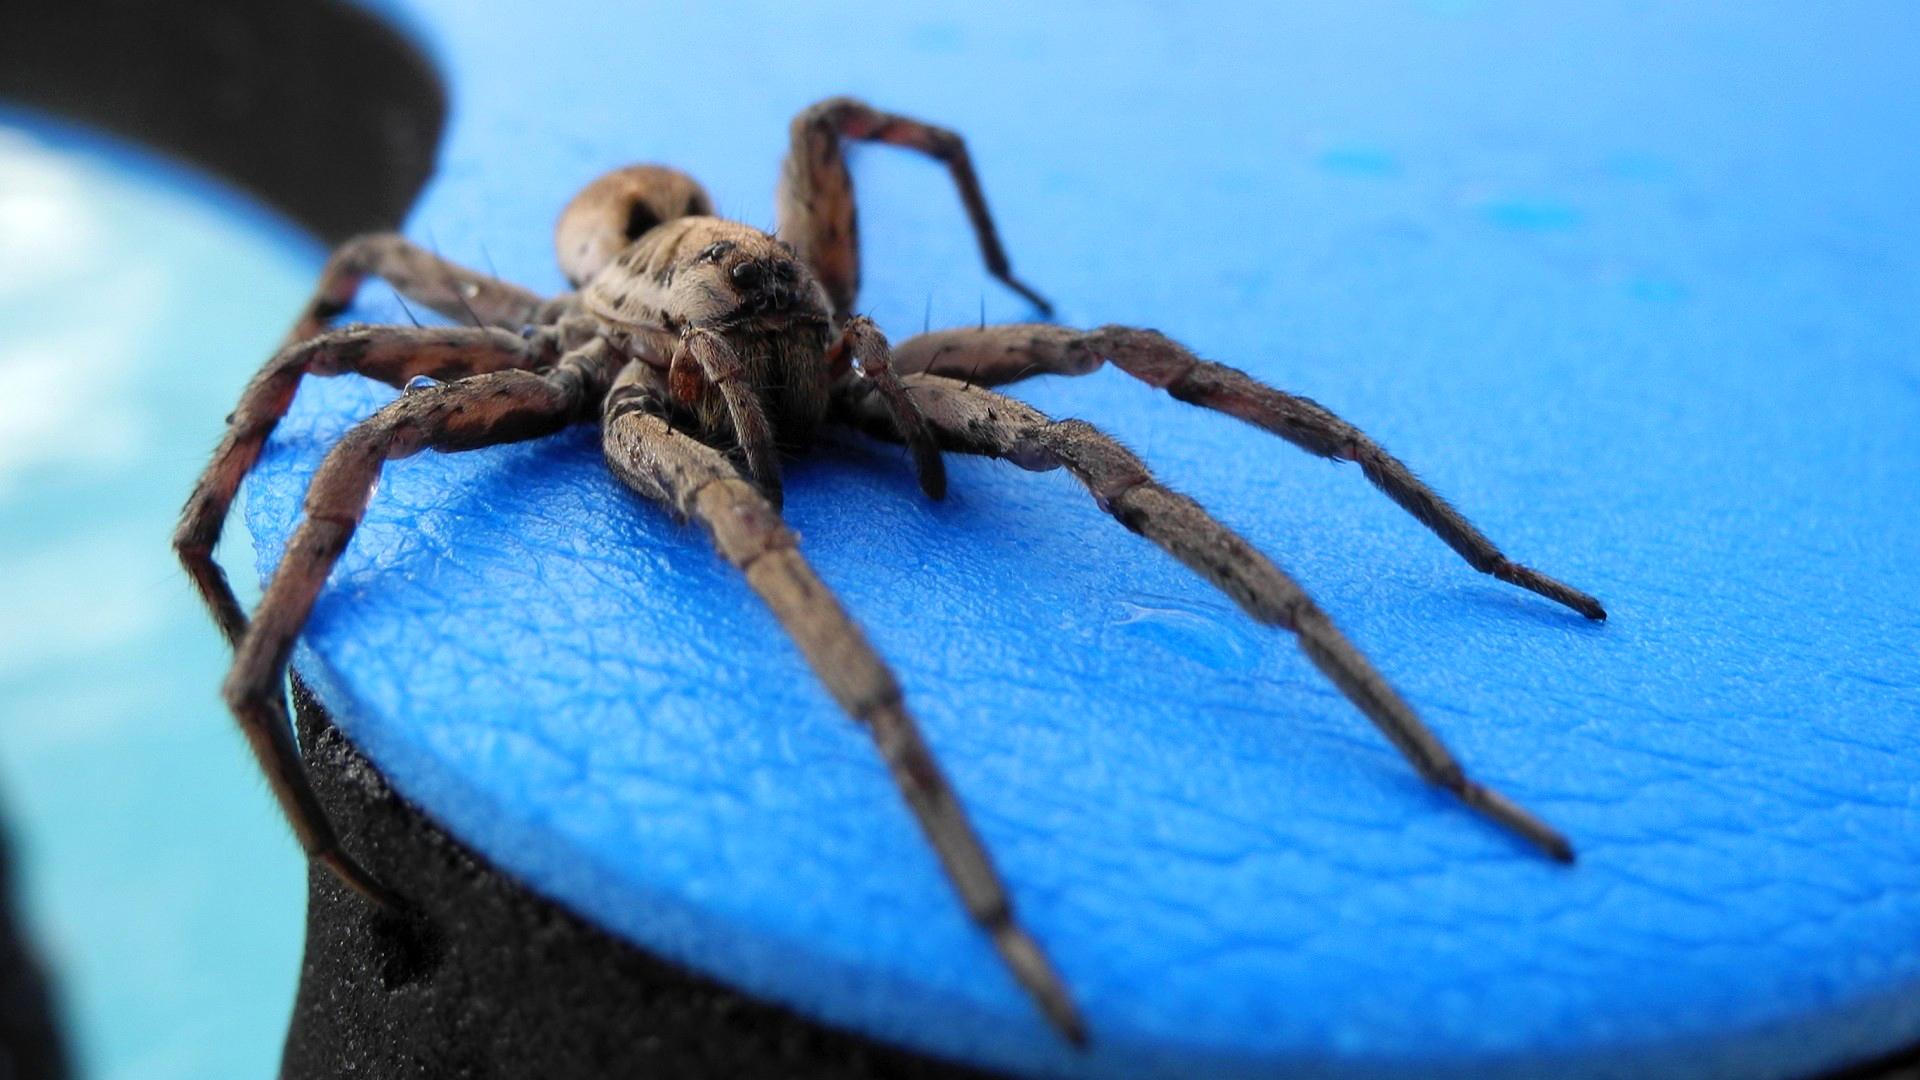 природа животные паук  № 2544214 без смс